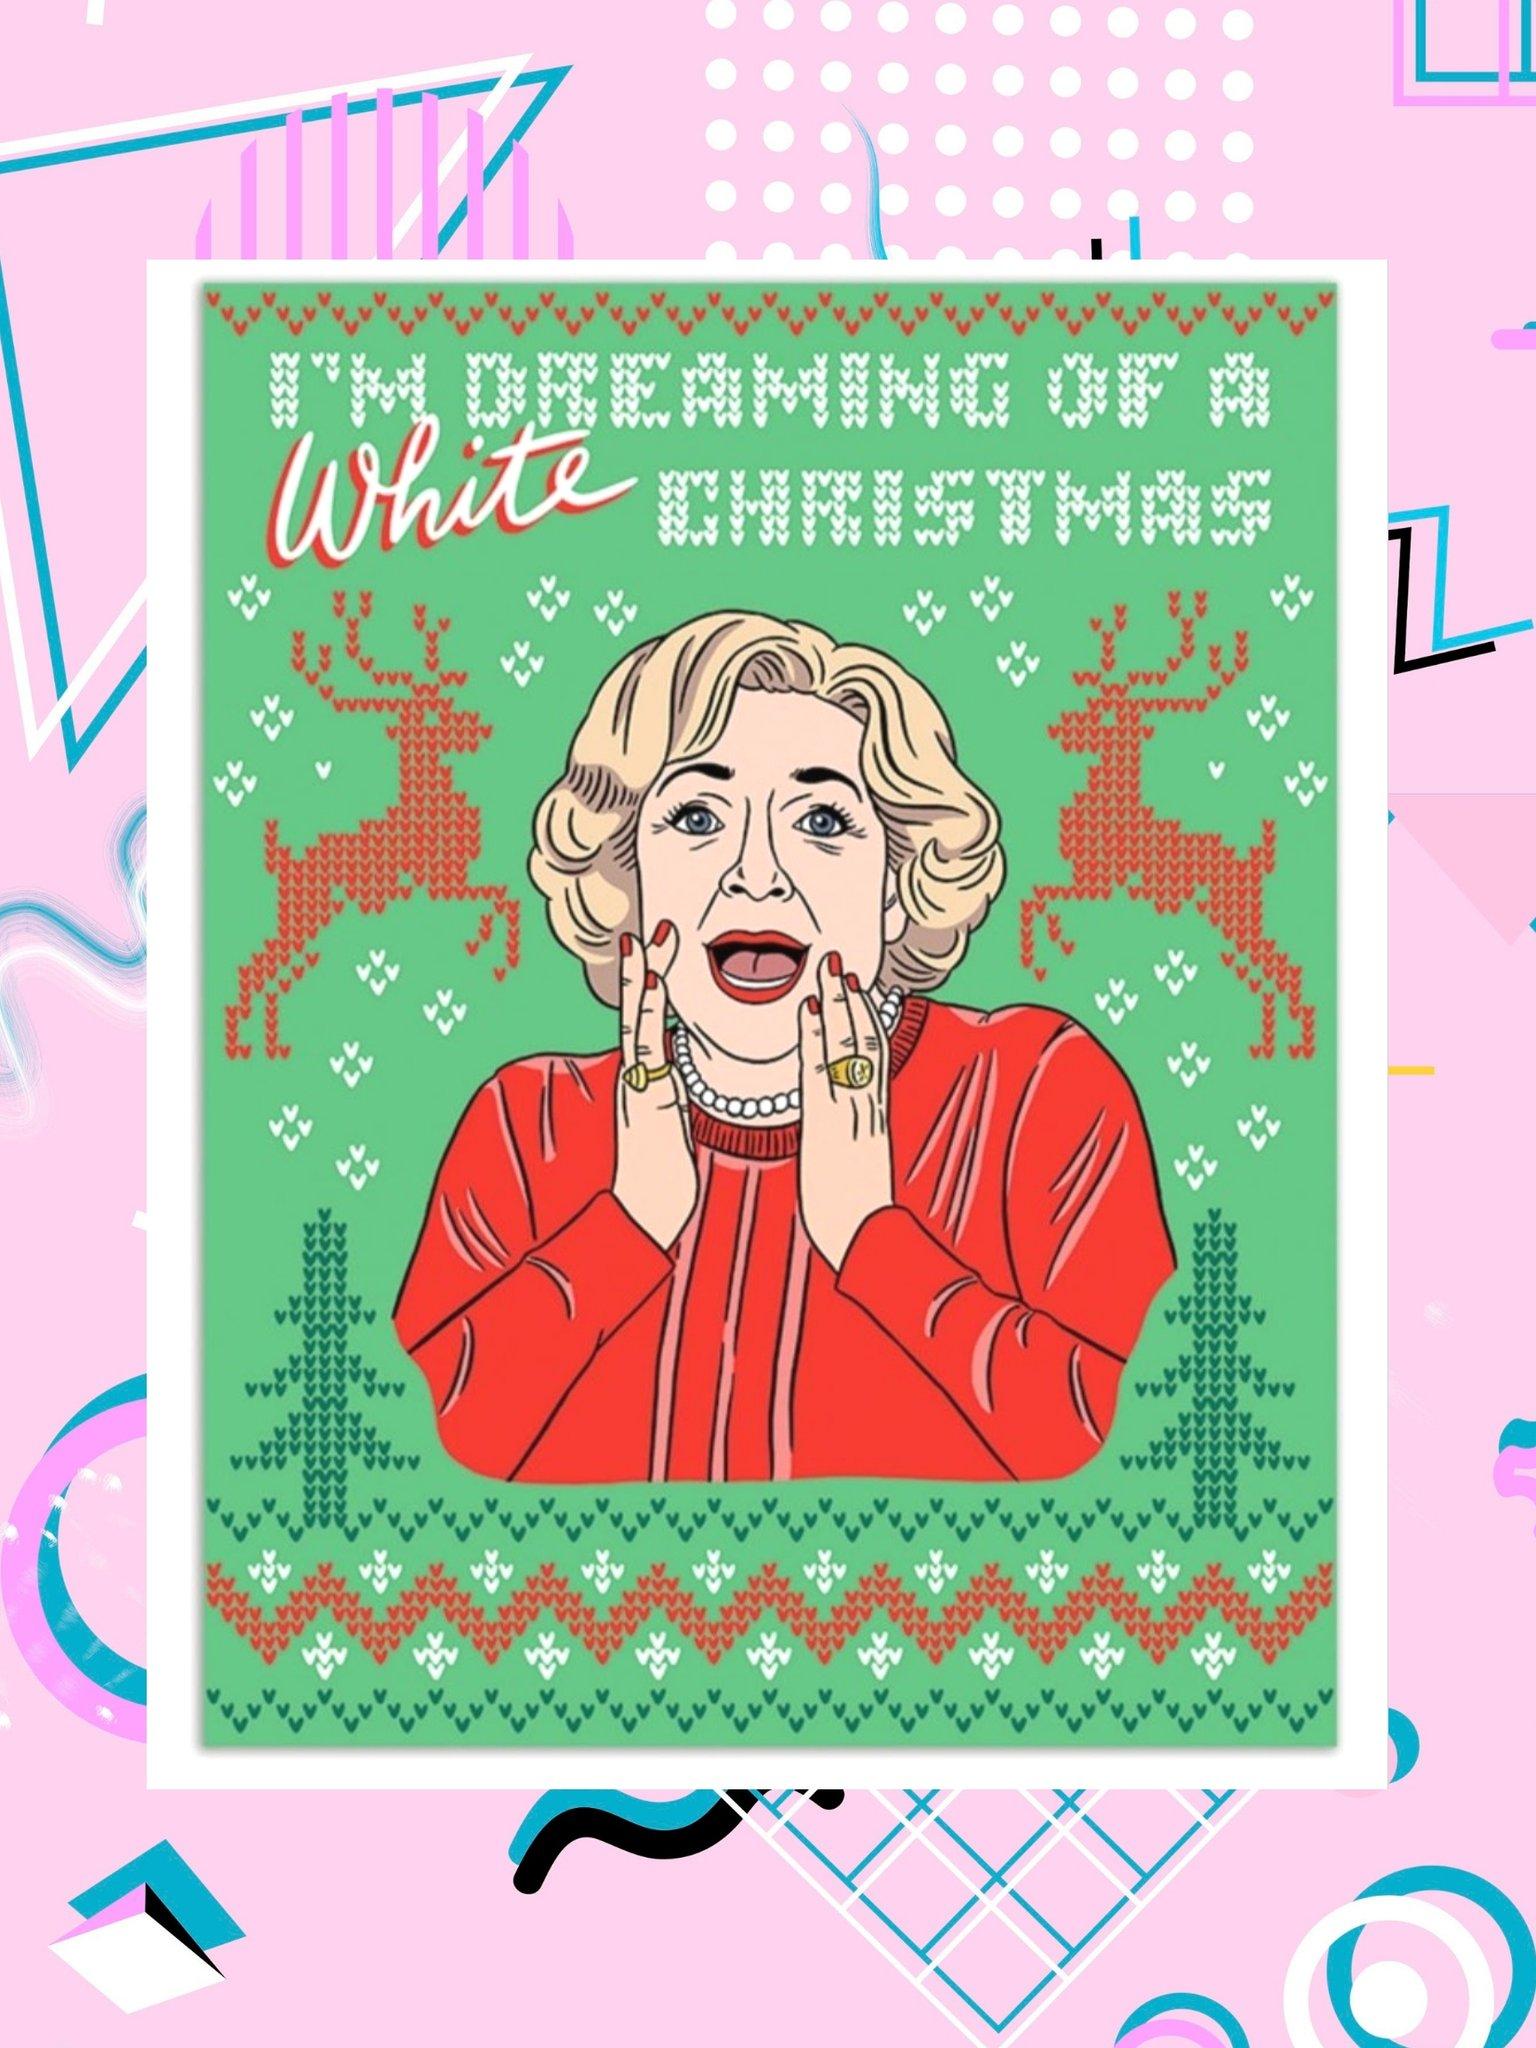 Betty_White_Christmas_Card_1024x1024@2x.jpg